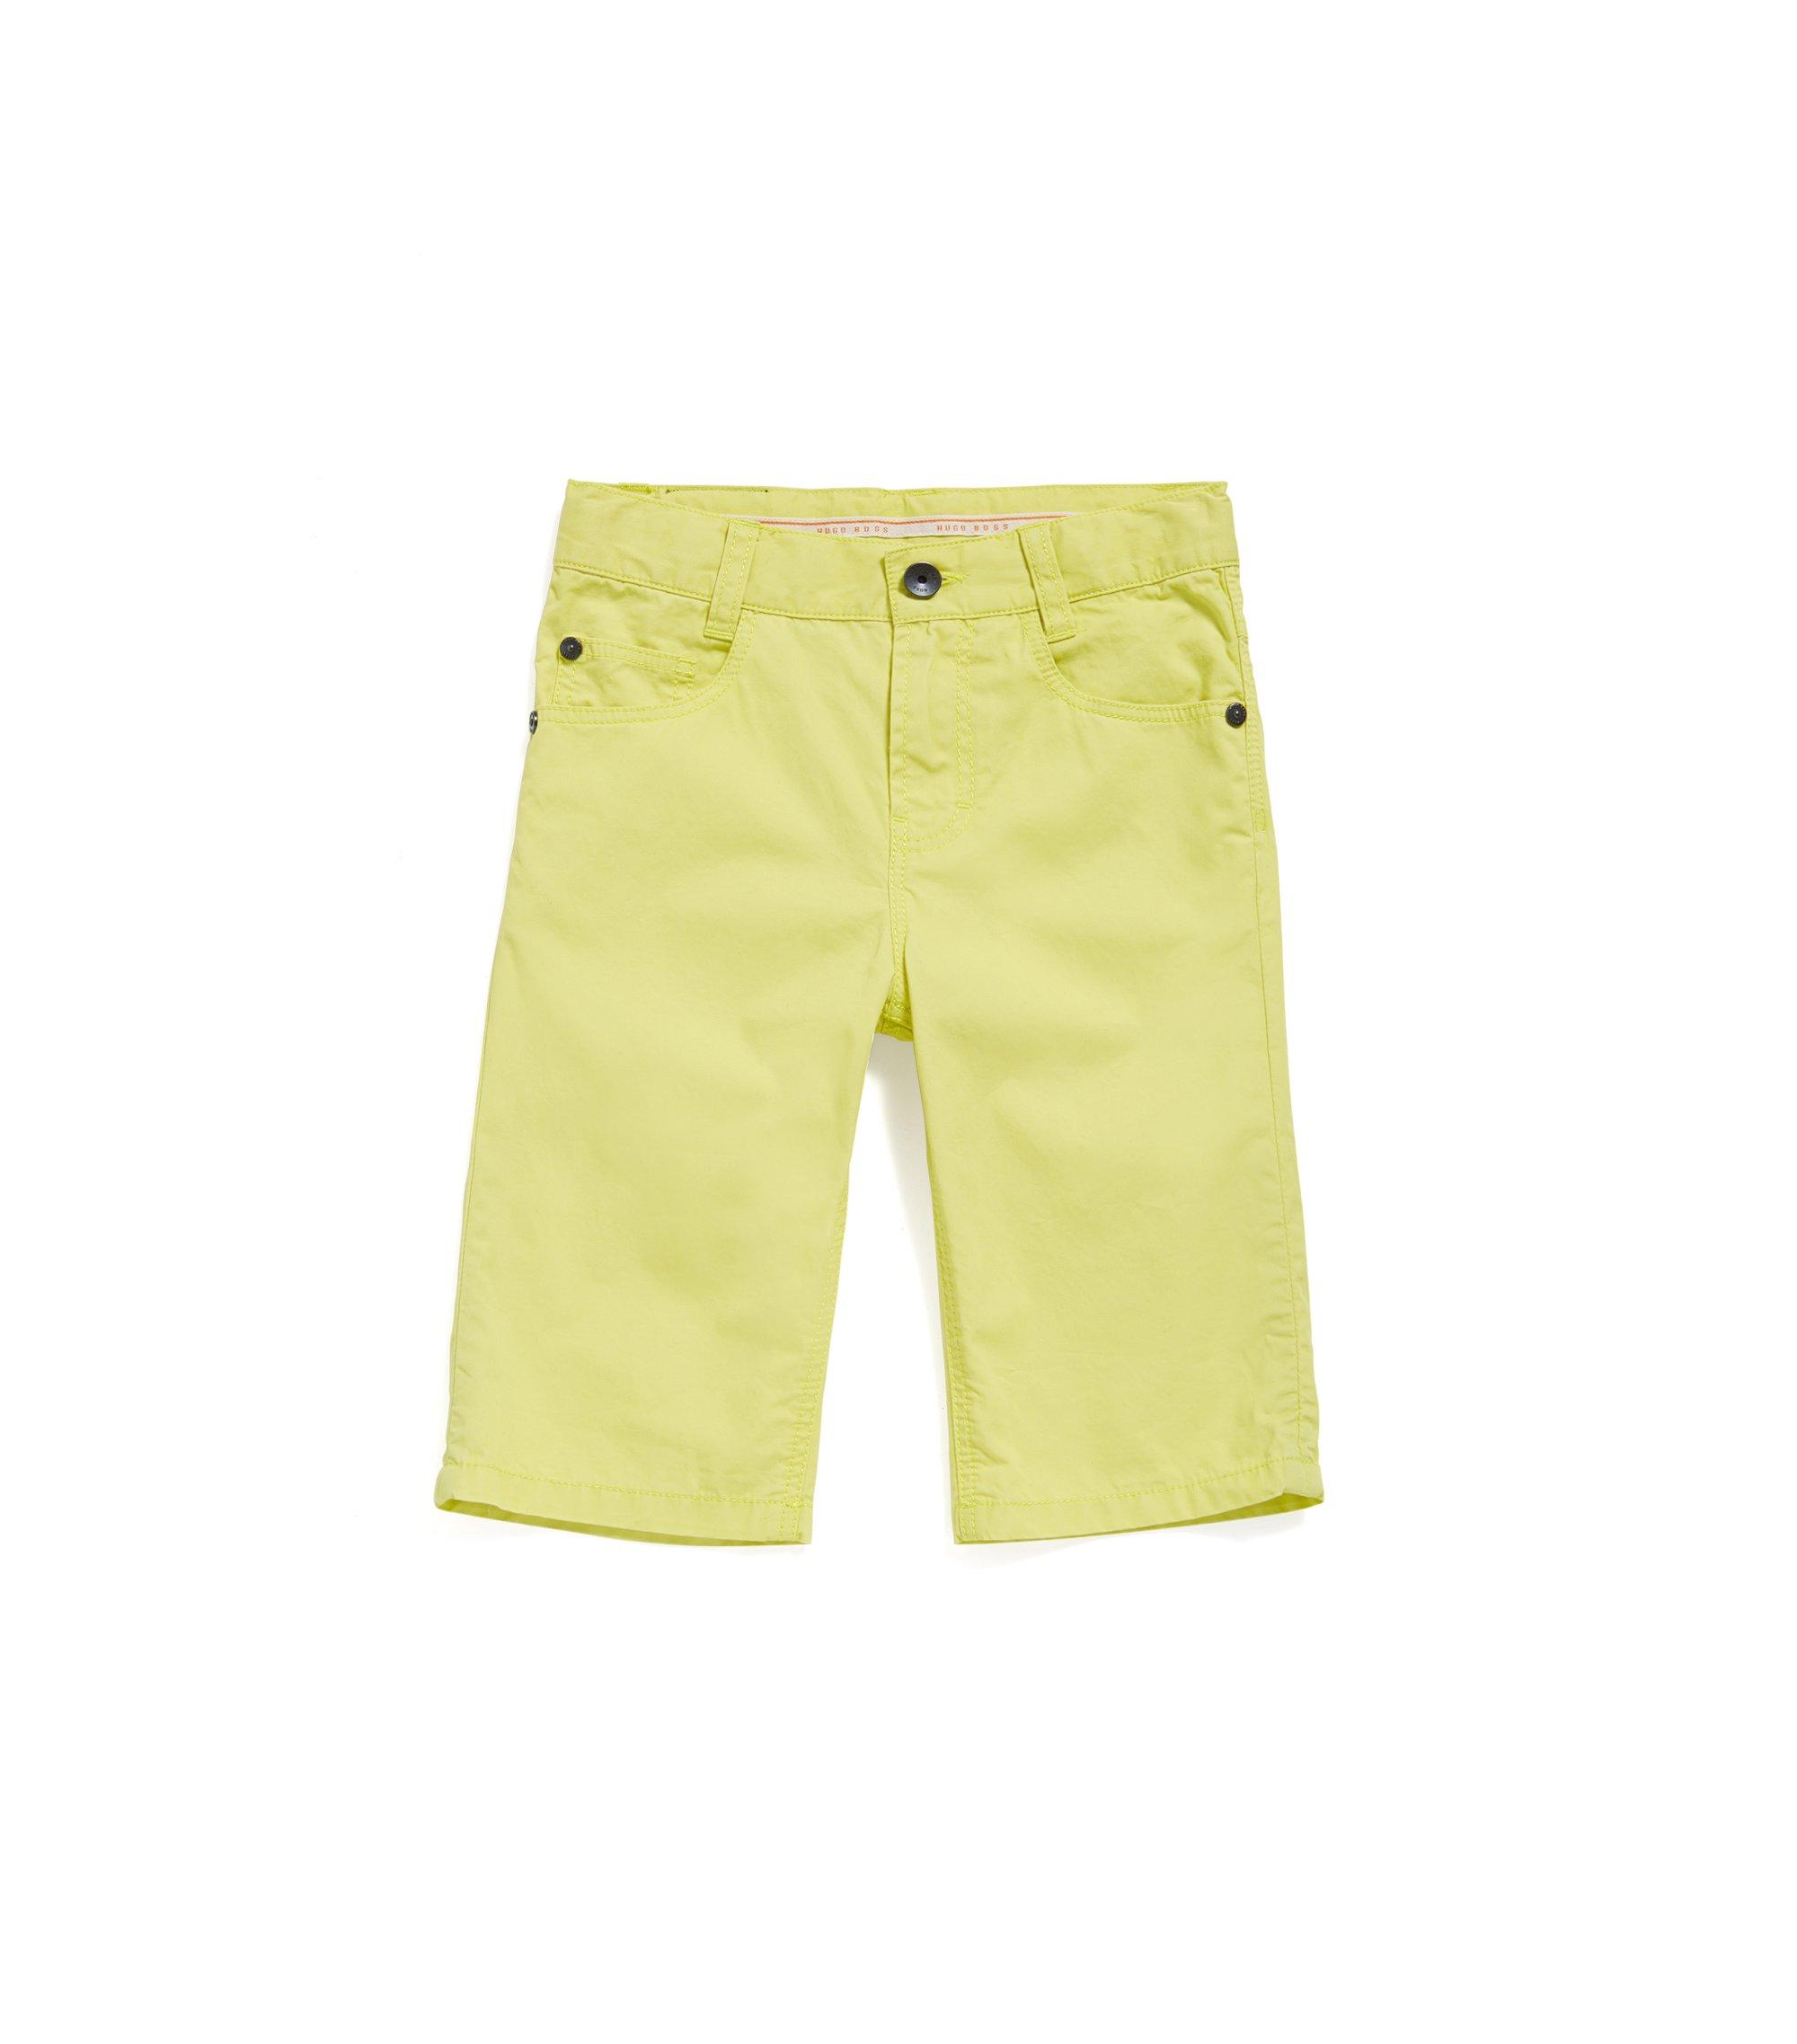 Shorts para niño en algodón con estilo de cinco bolsillos: 'J24433', Amarillo claro